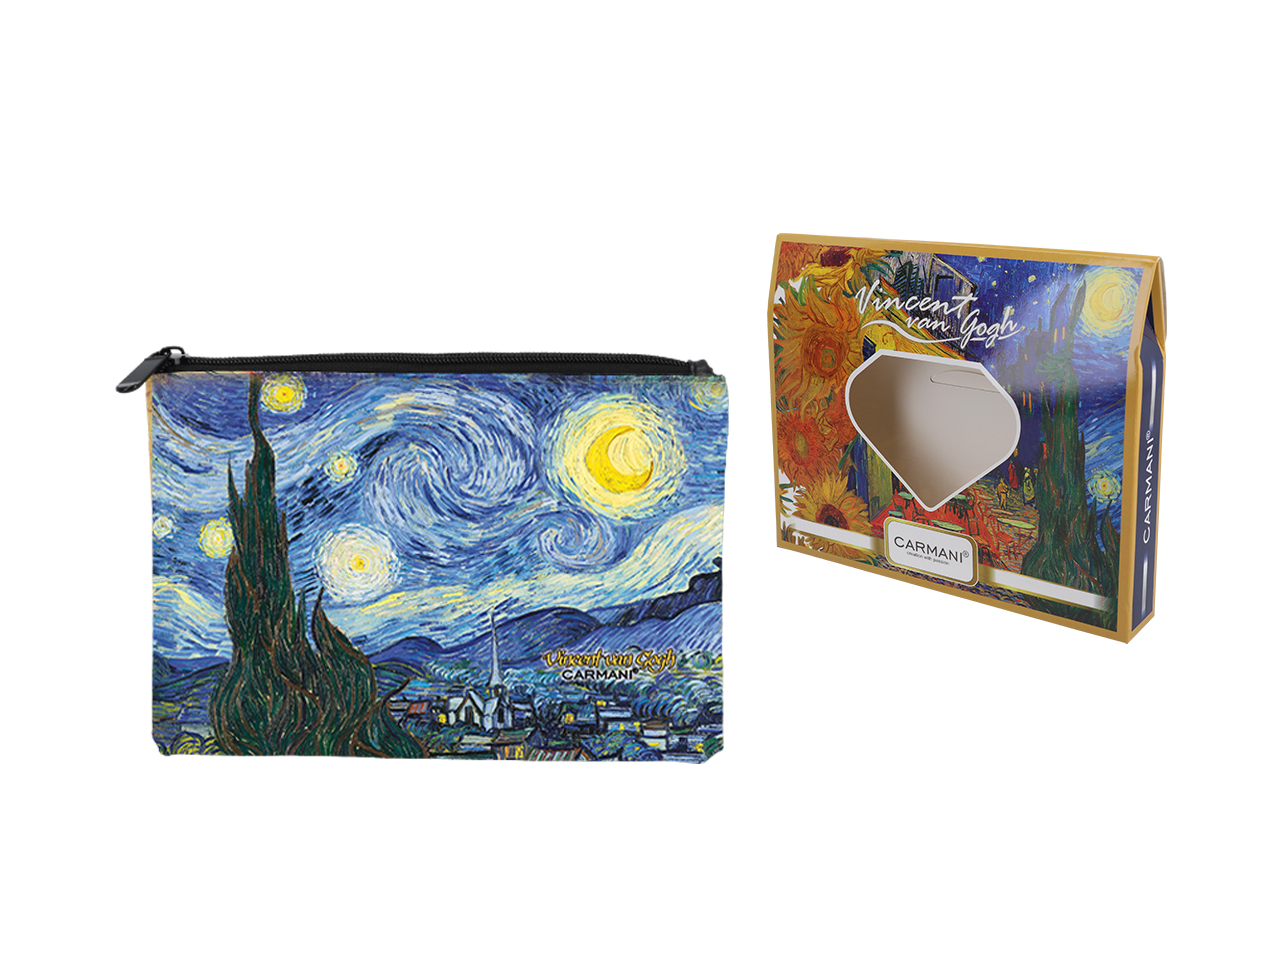 Mestres da pintura -V. Van Gogh- Noite Estrelada - Necessaire